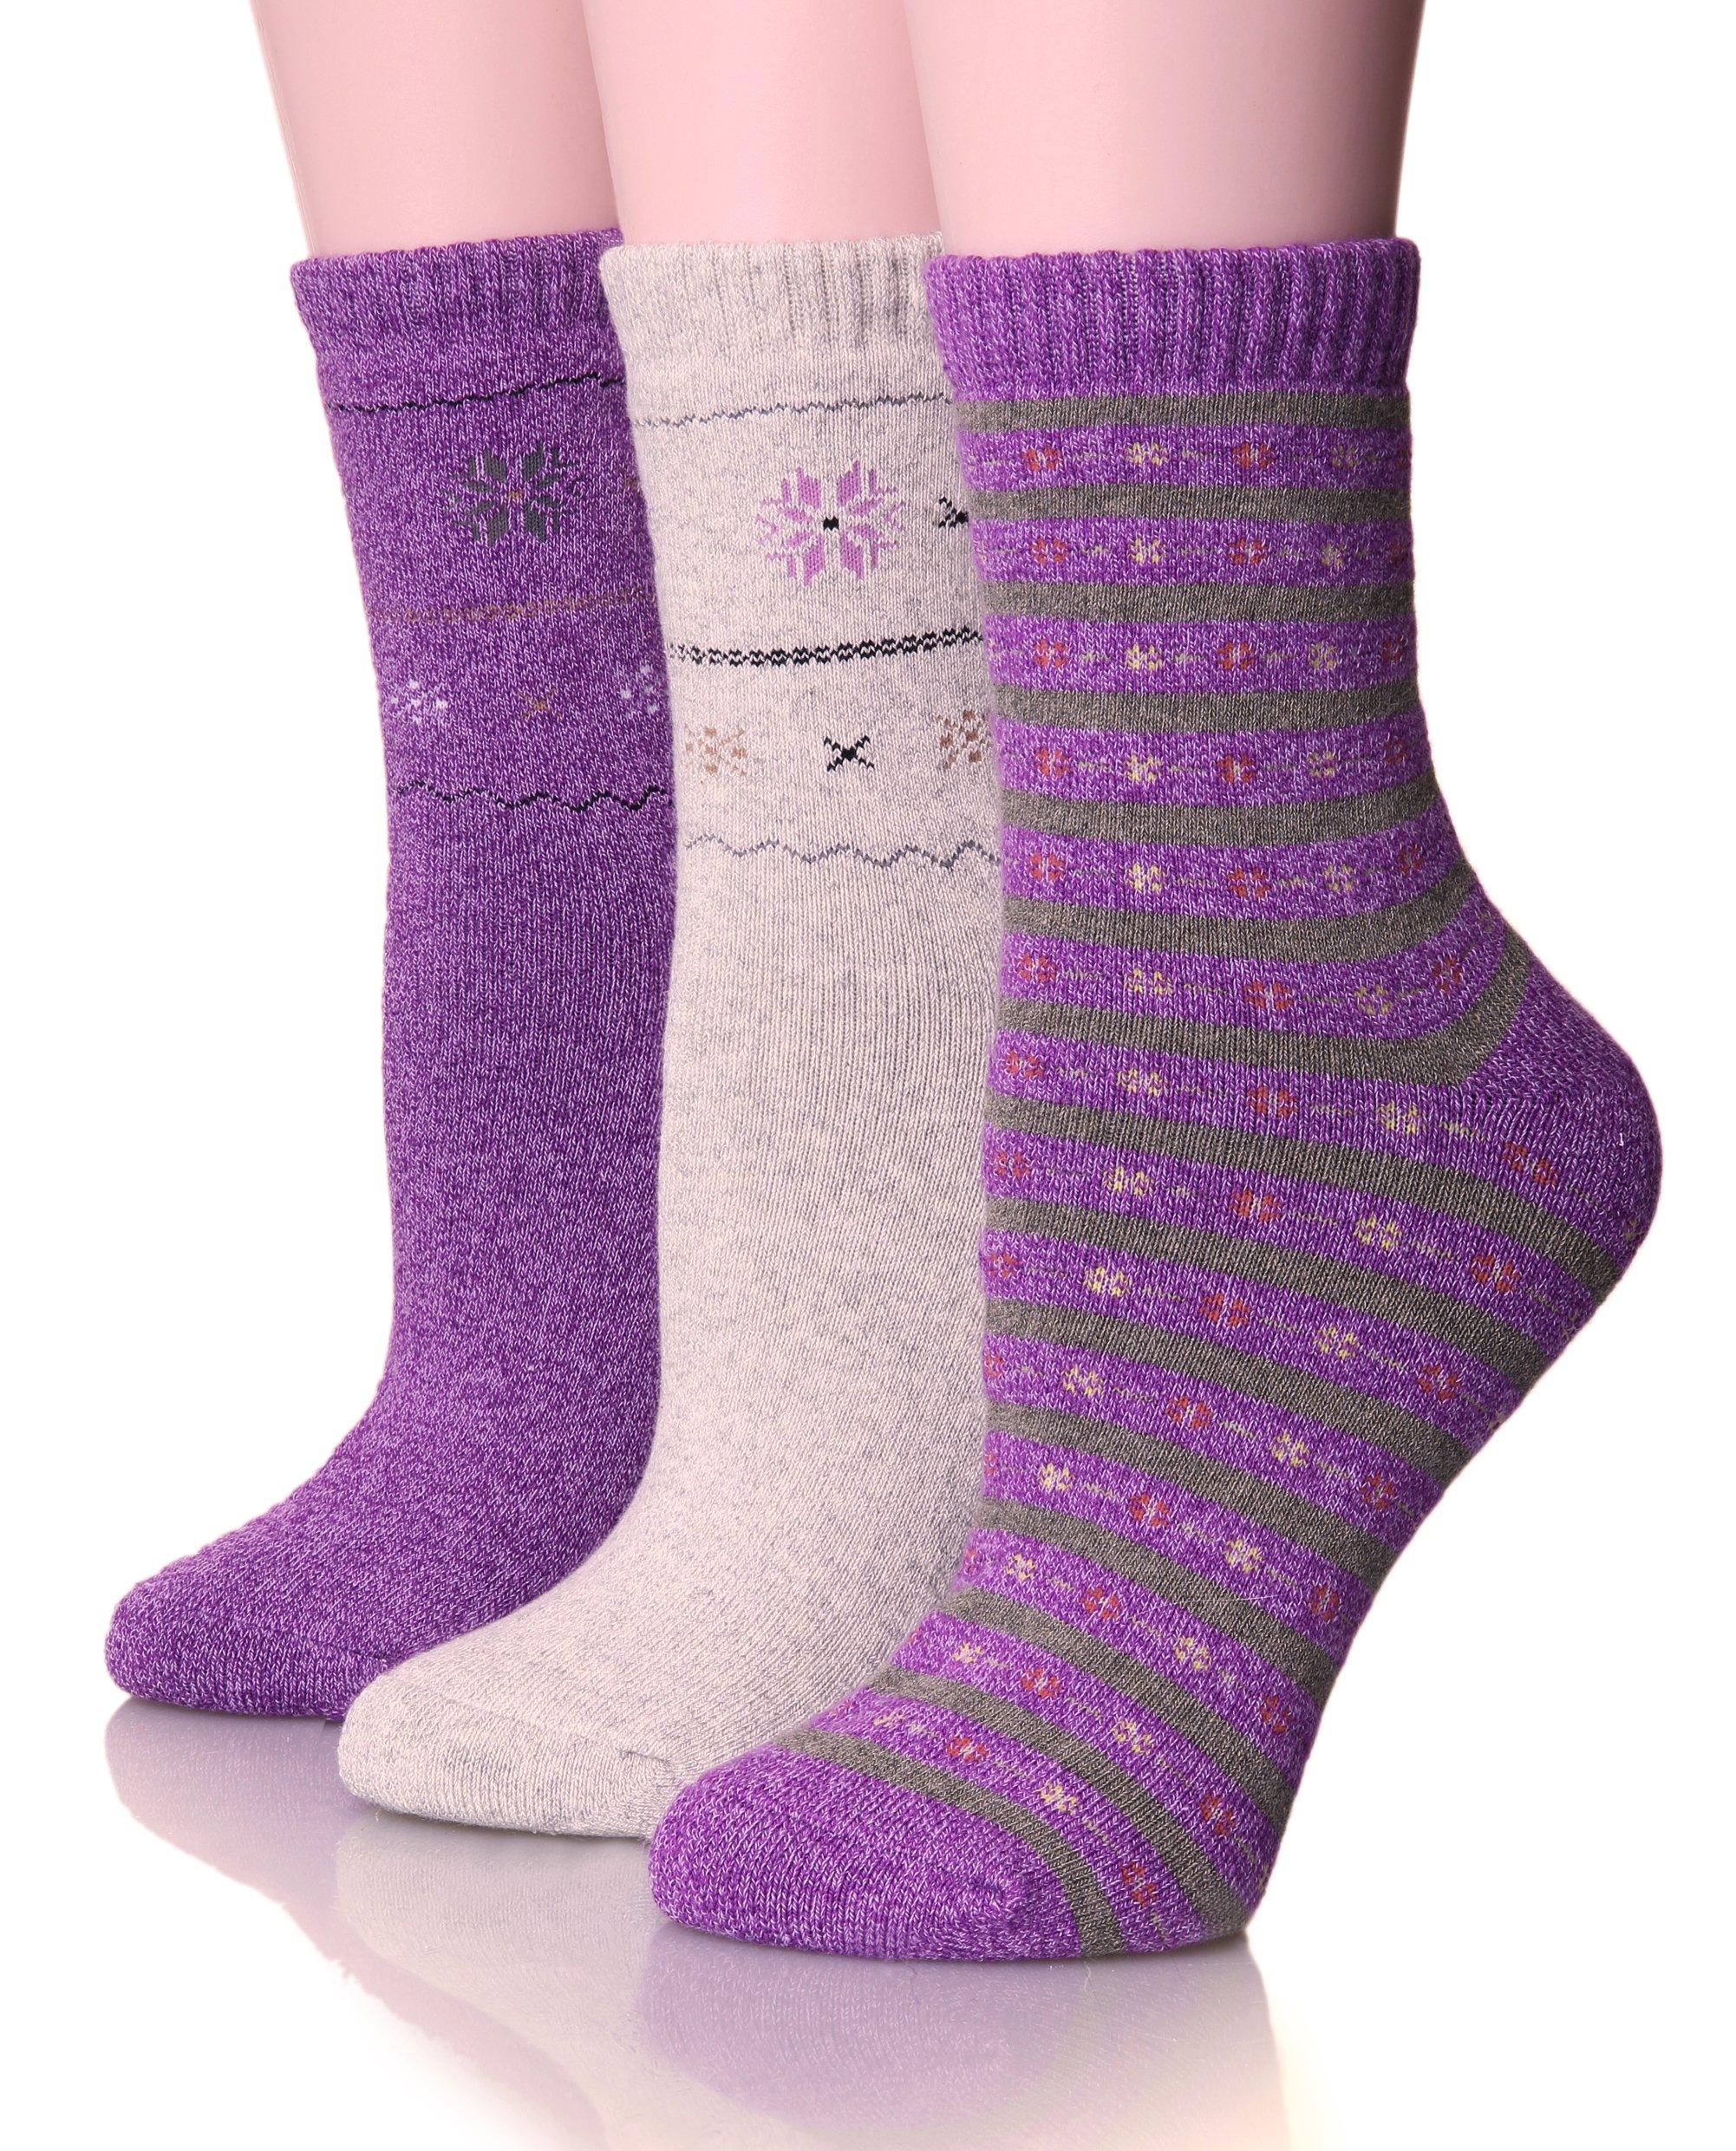 EBMORE Womens Thick Cotton Socks Soft Warm Crew Winter Cold Weather Socks 3 Pack (Purple)